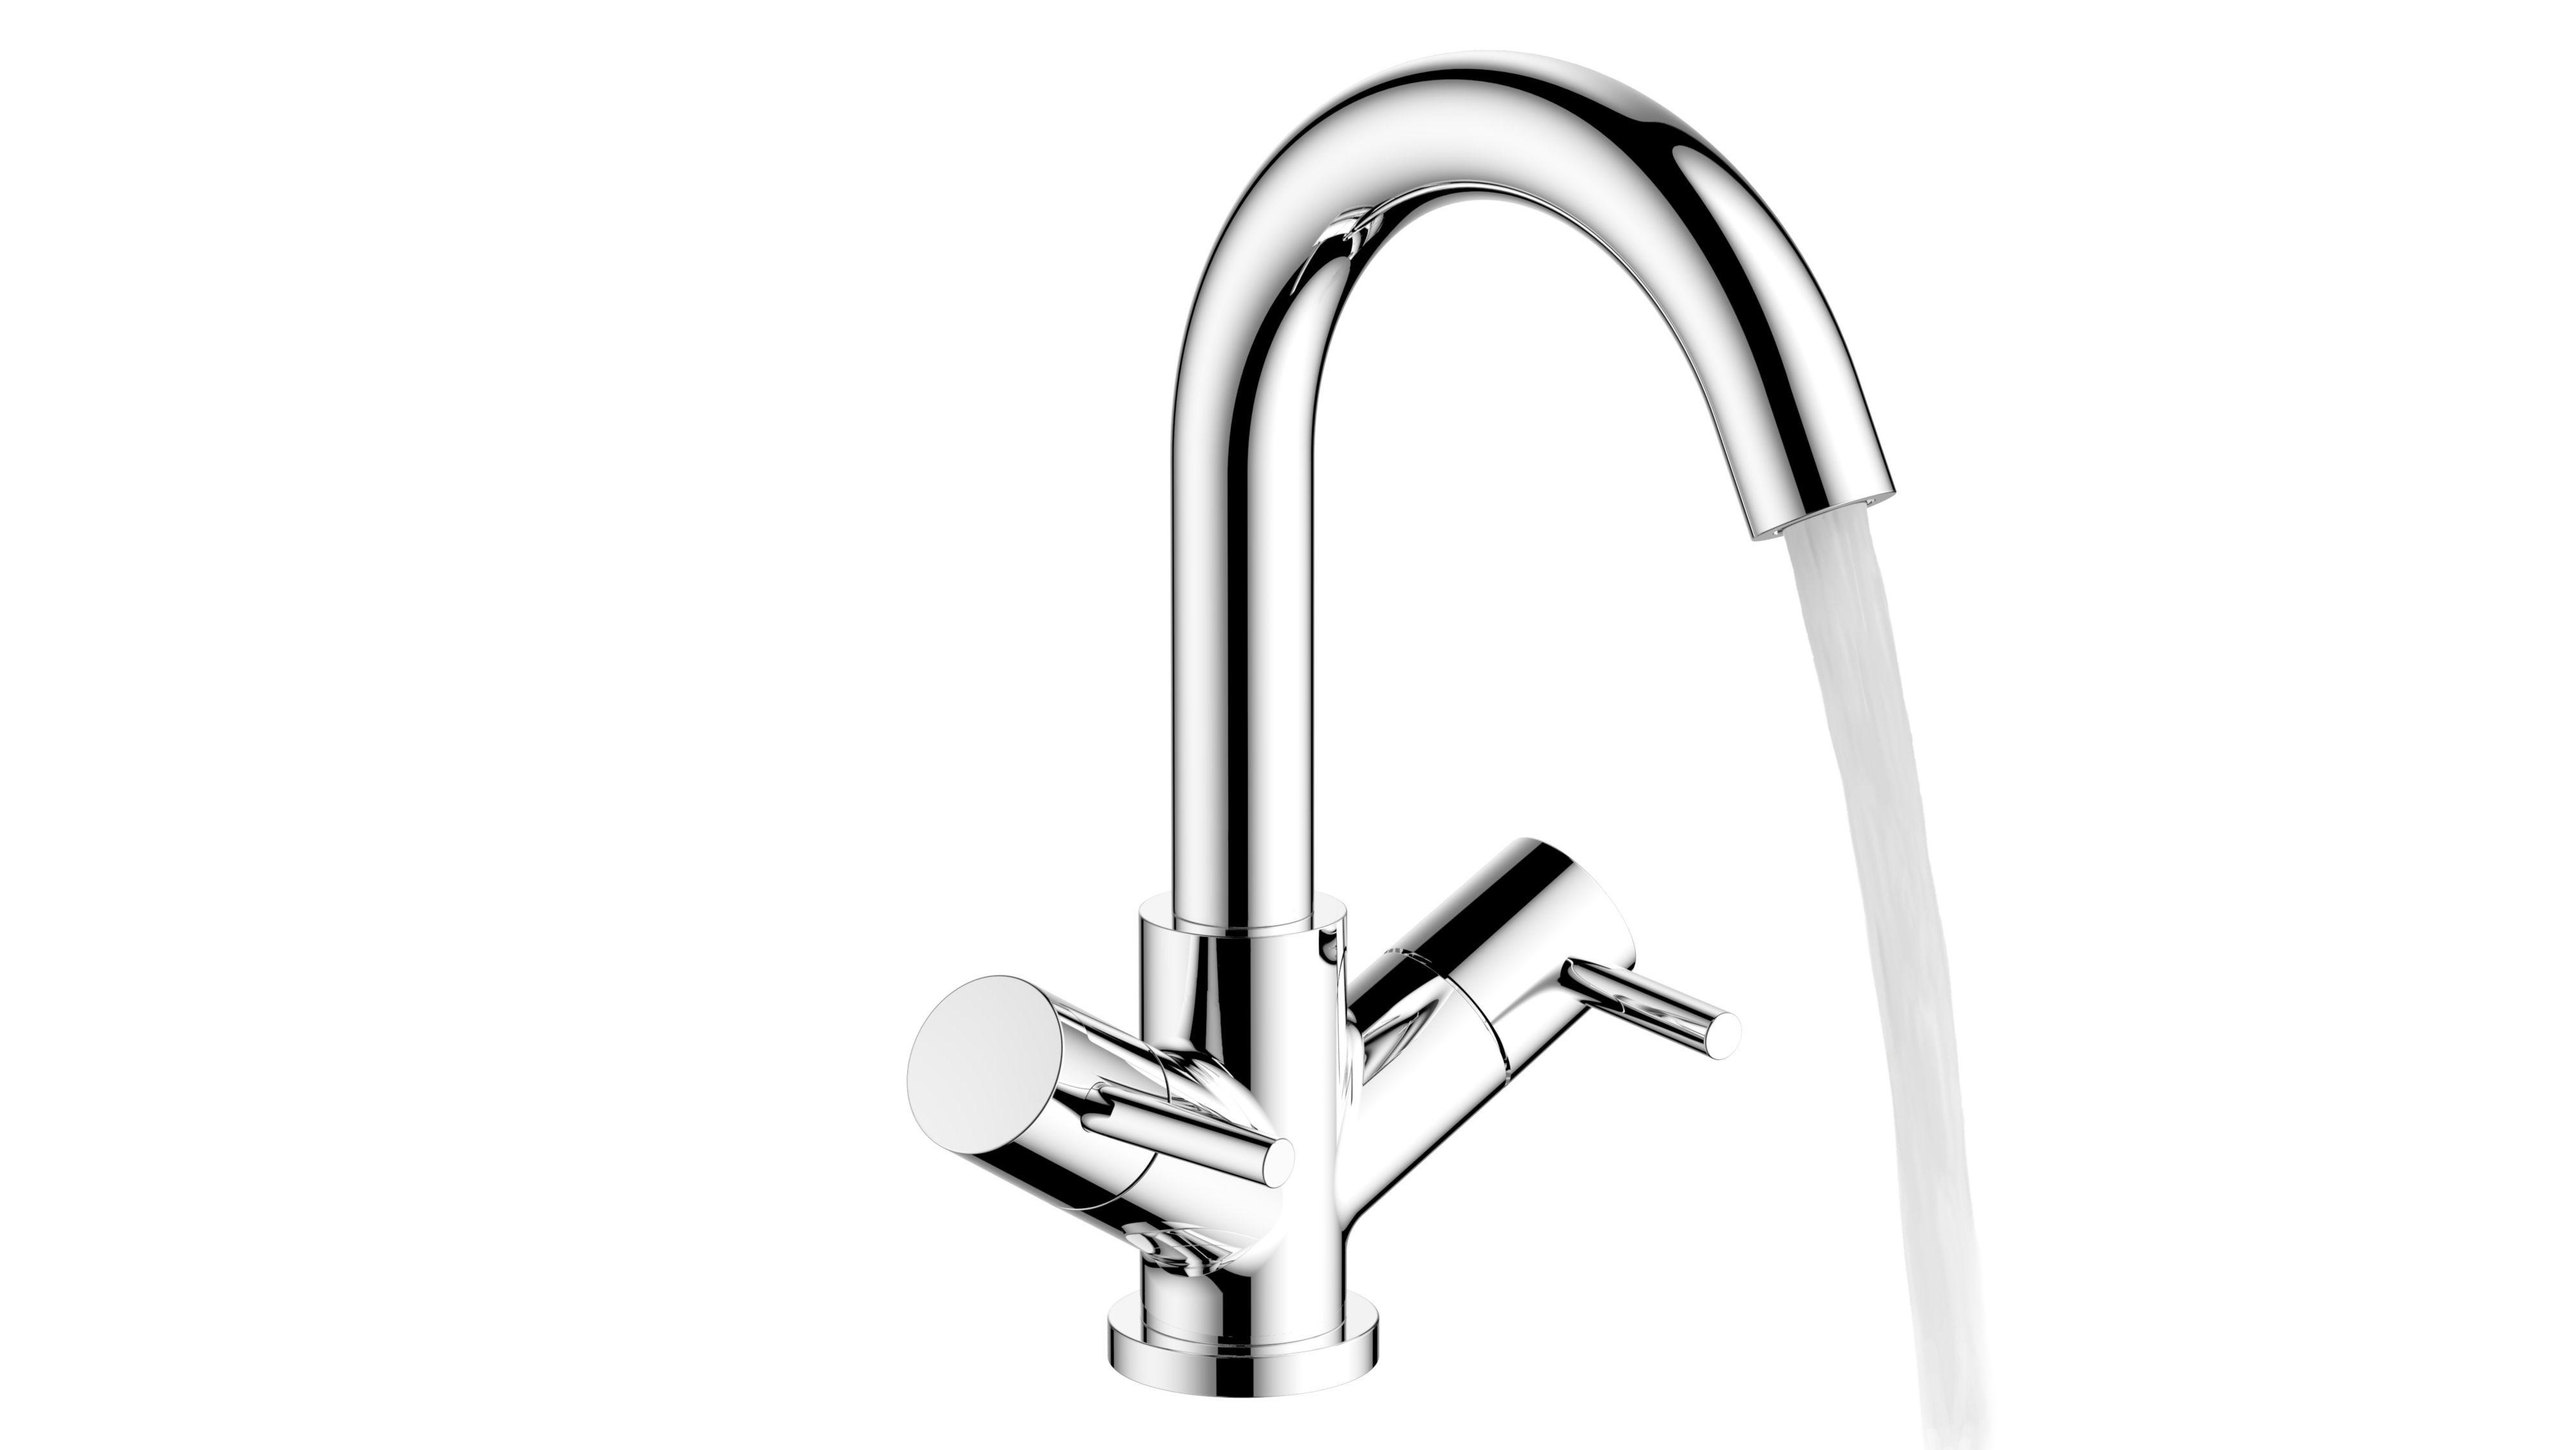 cooke lewis classic 2 lever basin mixer tap. Black Bedroom Furniture Sets. Home Design Ideas